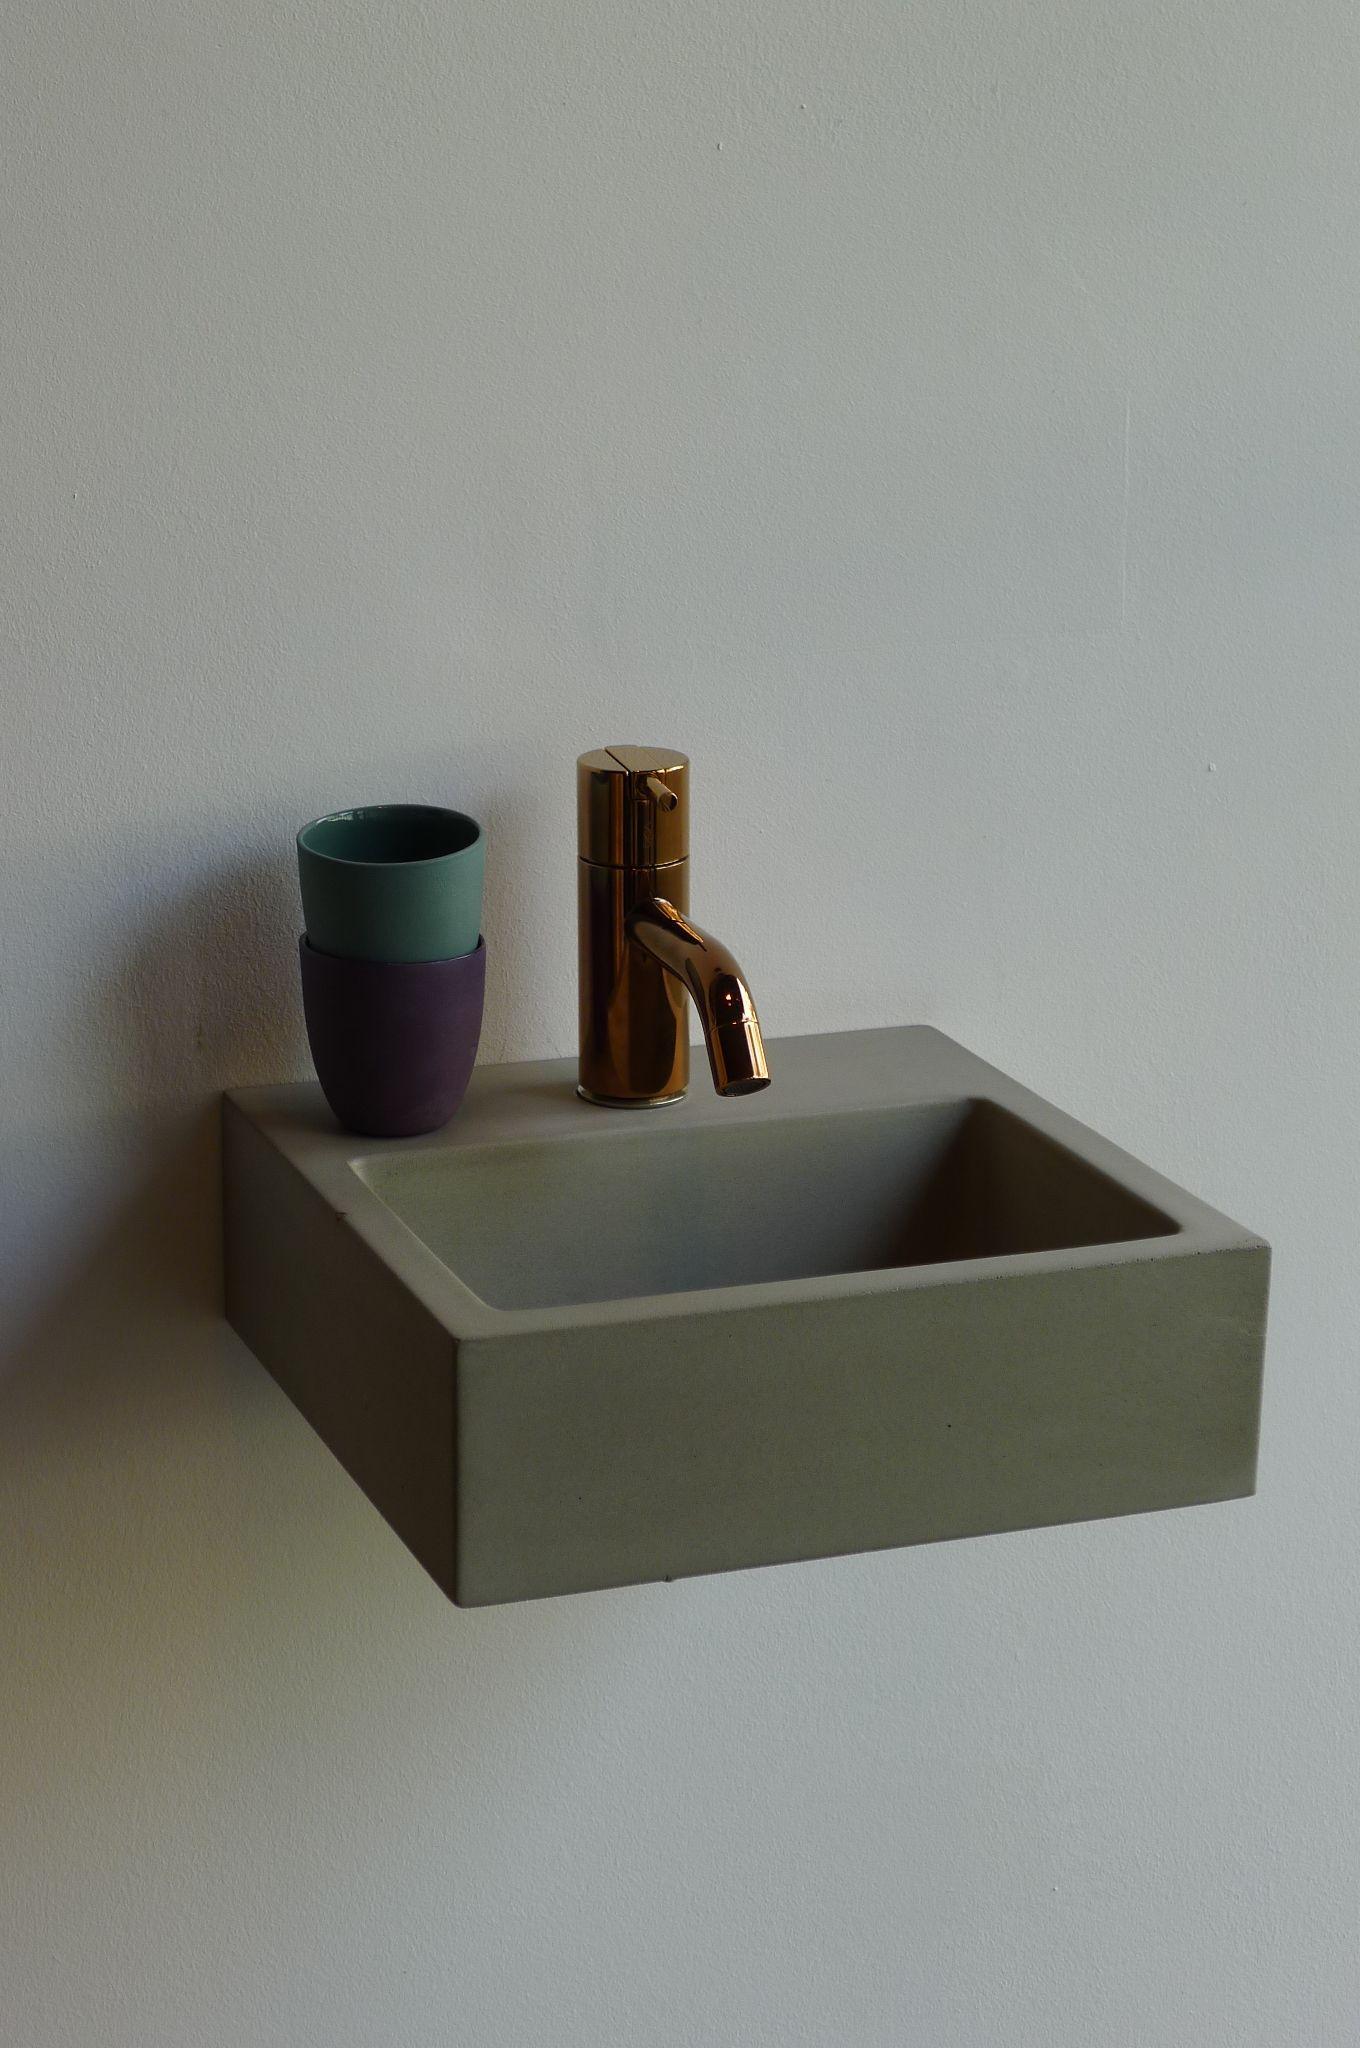 vola copper mud autstralia clou styling joosttromp baden baden